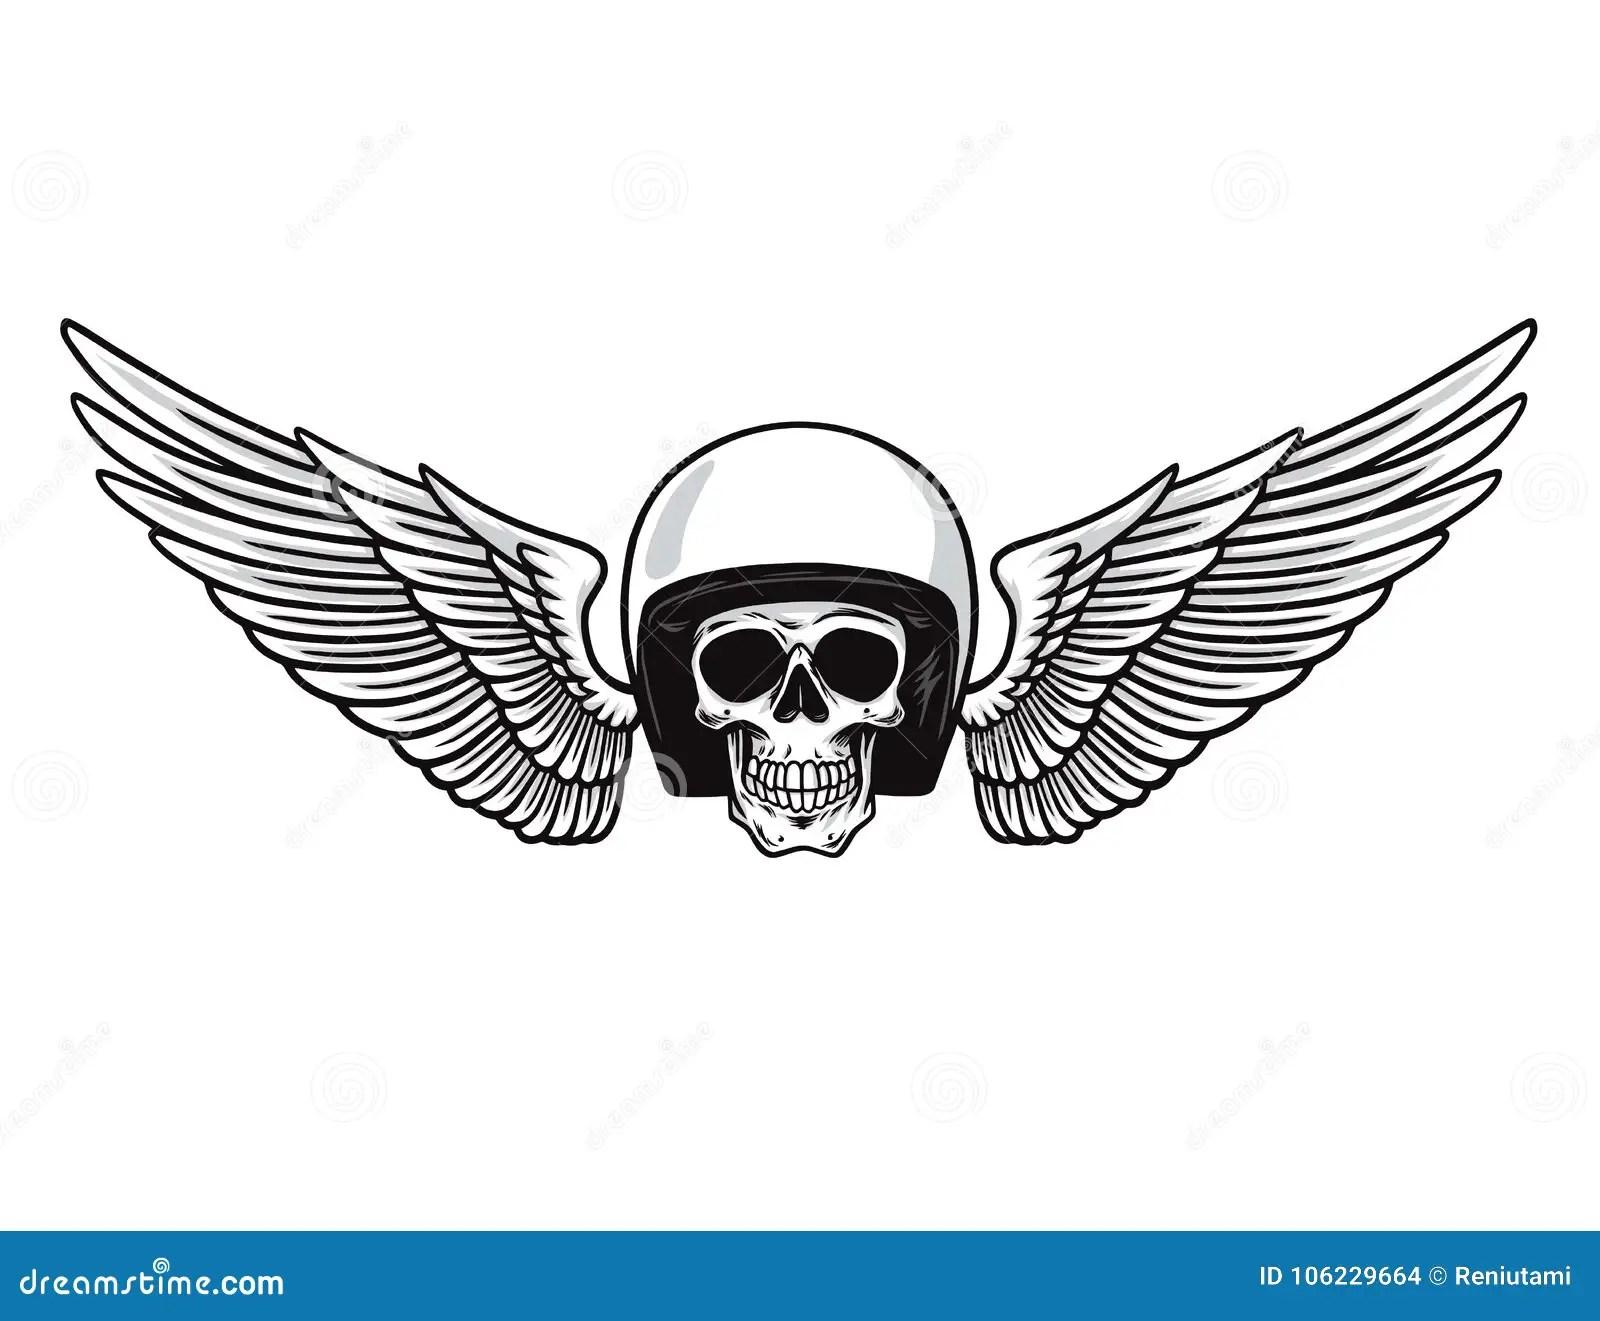 Motor Skull Vector Graphic Motorcycle Vintage Cartoon